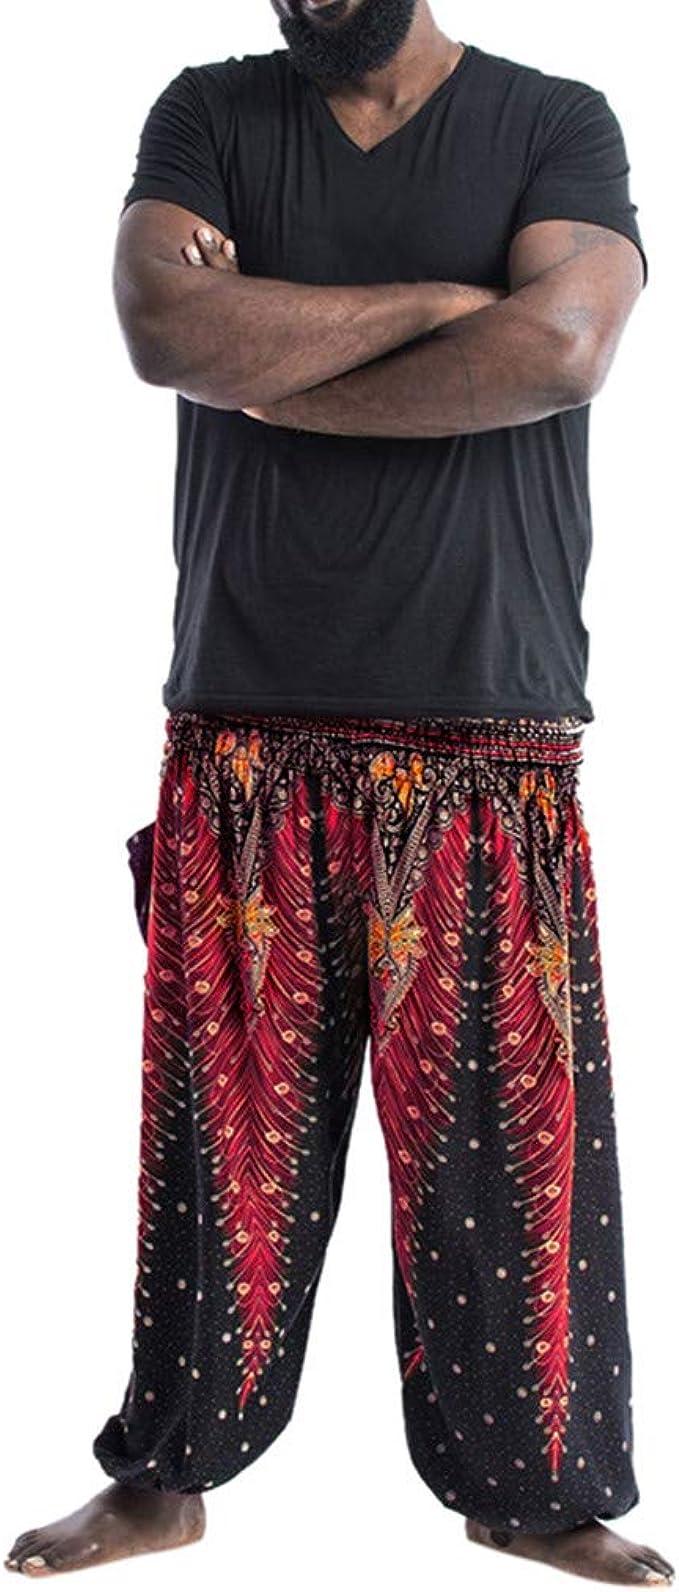 Amazon.com: PAQOZ Yoga Pants, Men 4 Way Stretch Casual Loose ...